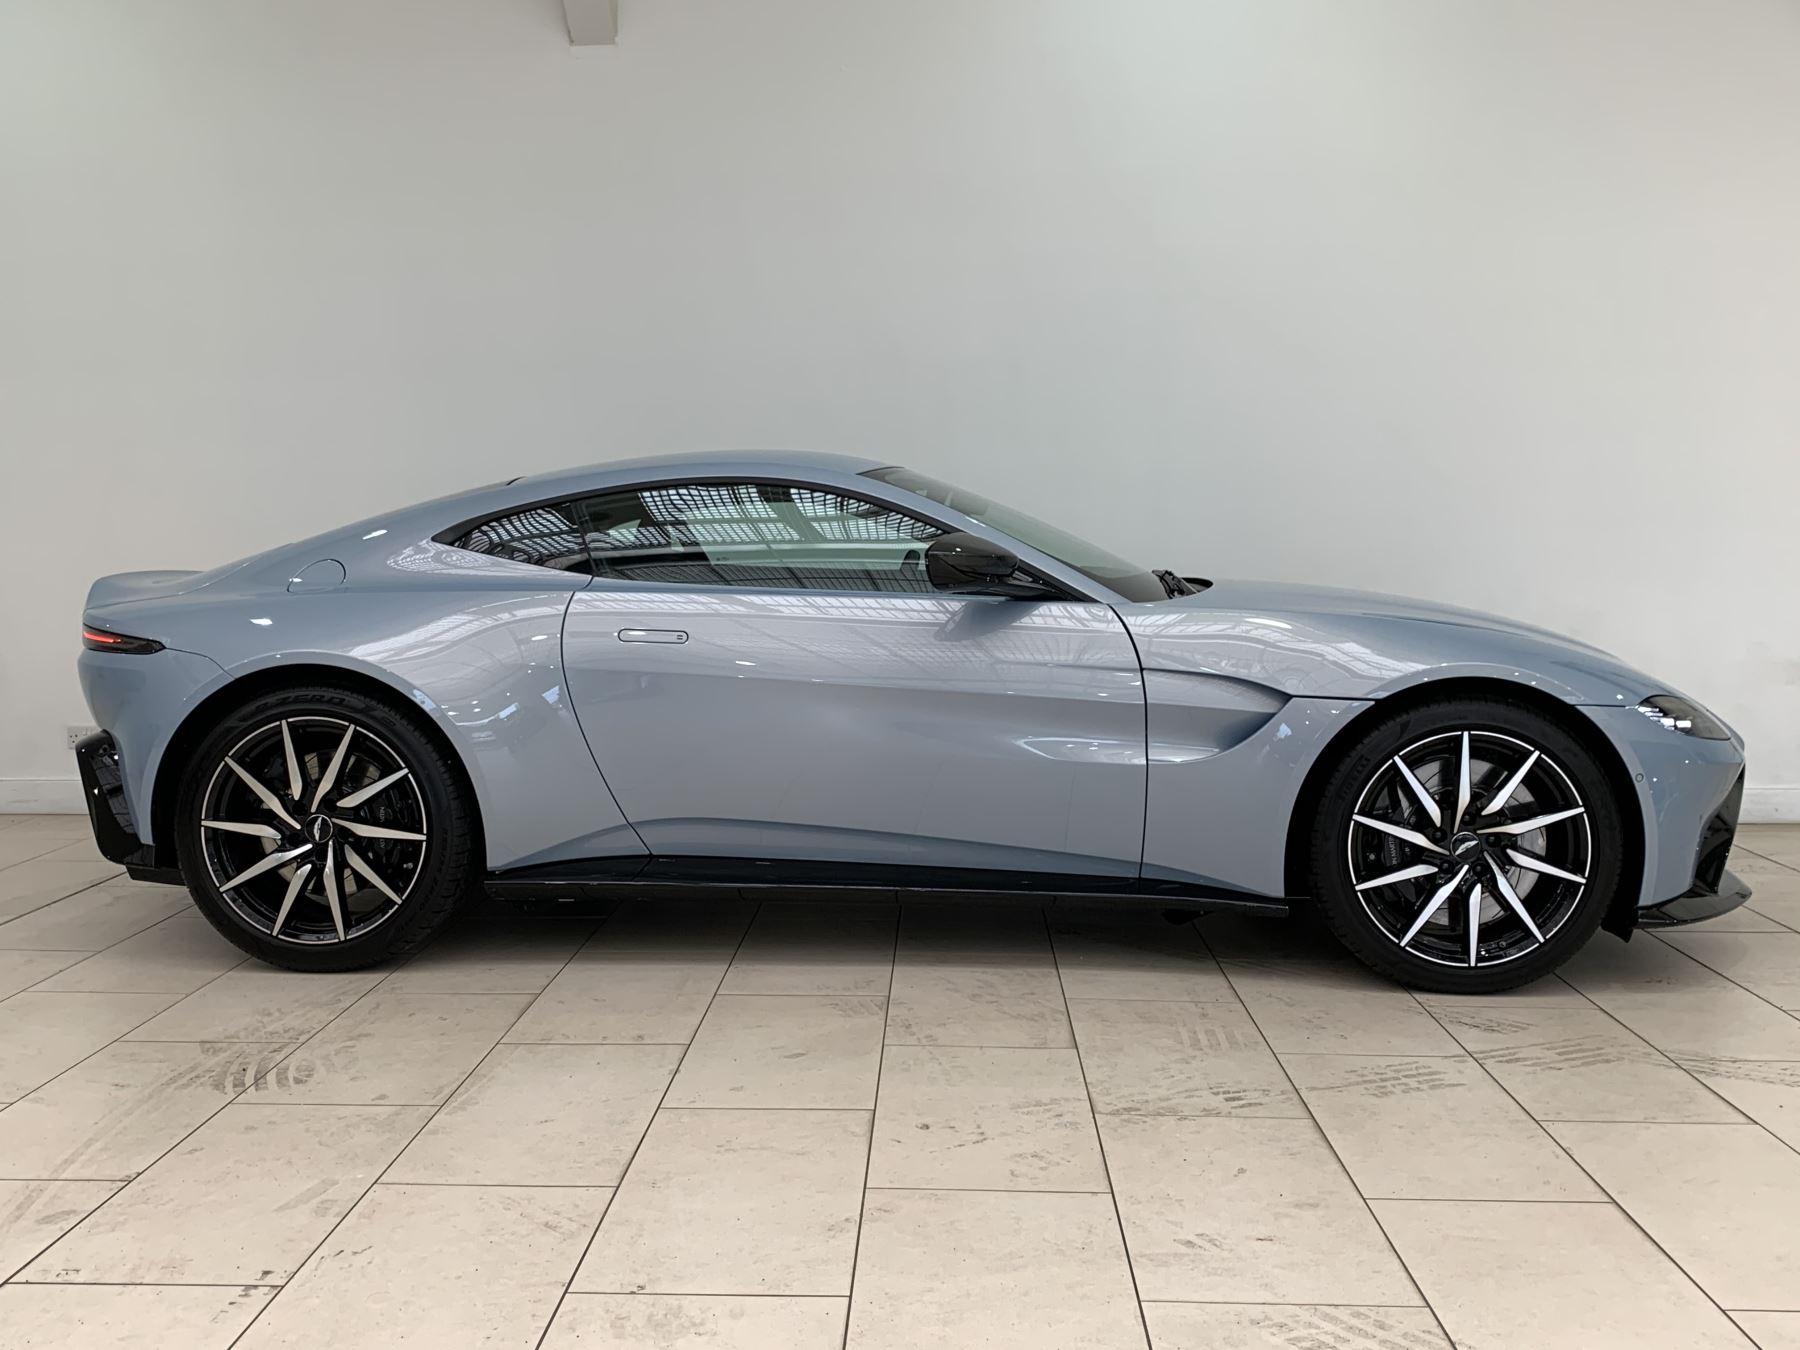 Aston Martin New Vantage 2dr ZF 8 Speed image 2